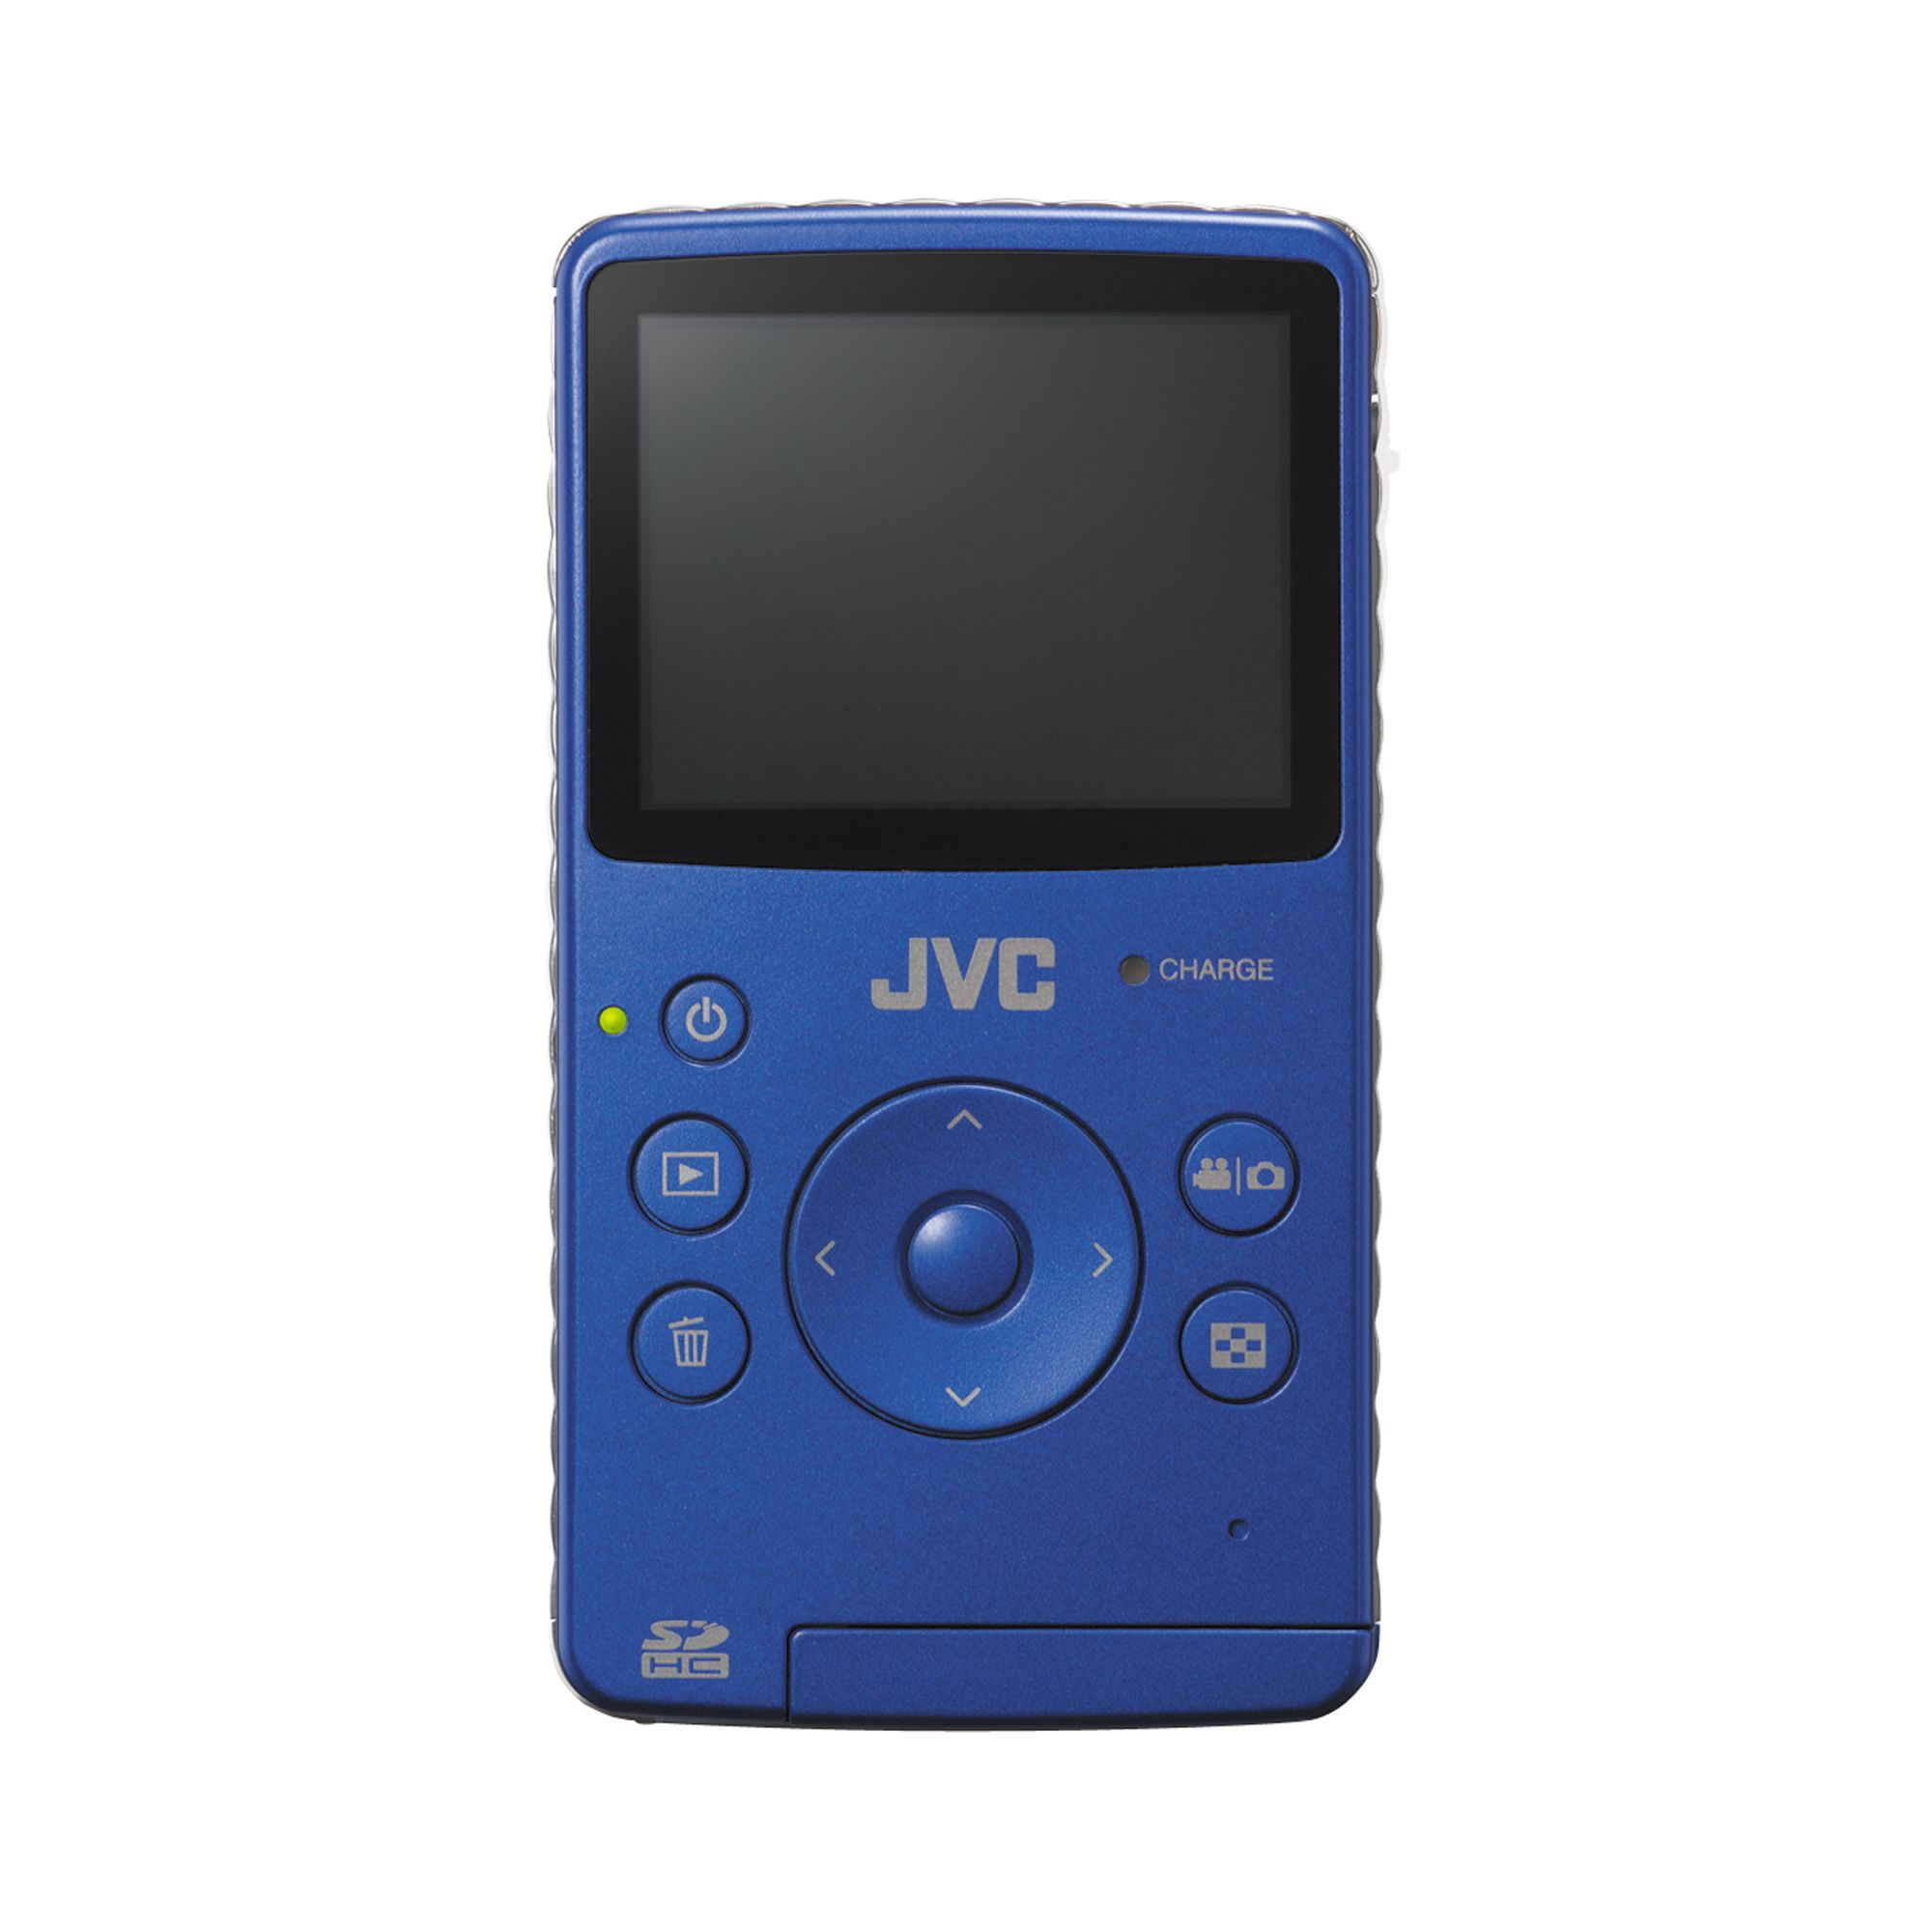 JVC Picsio Pocket Flash Memory Camcorder - Blue